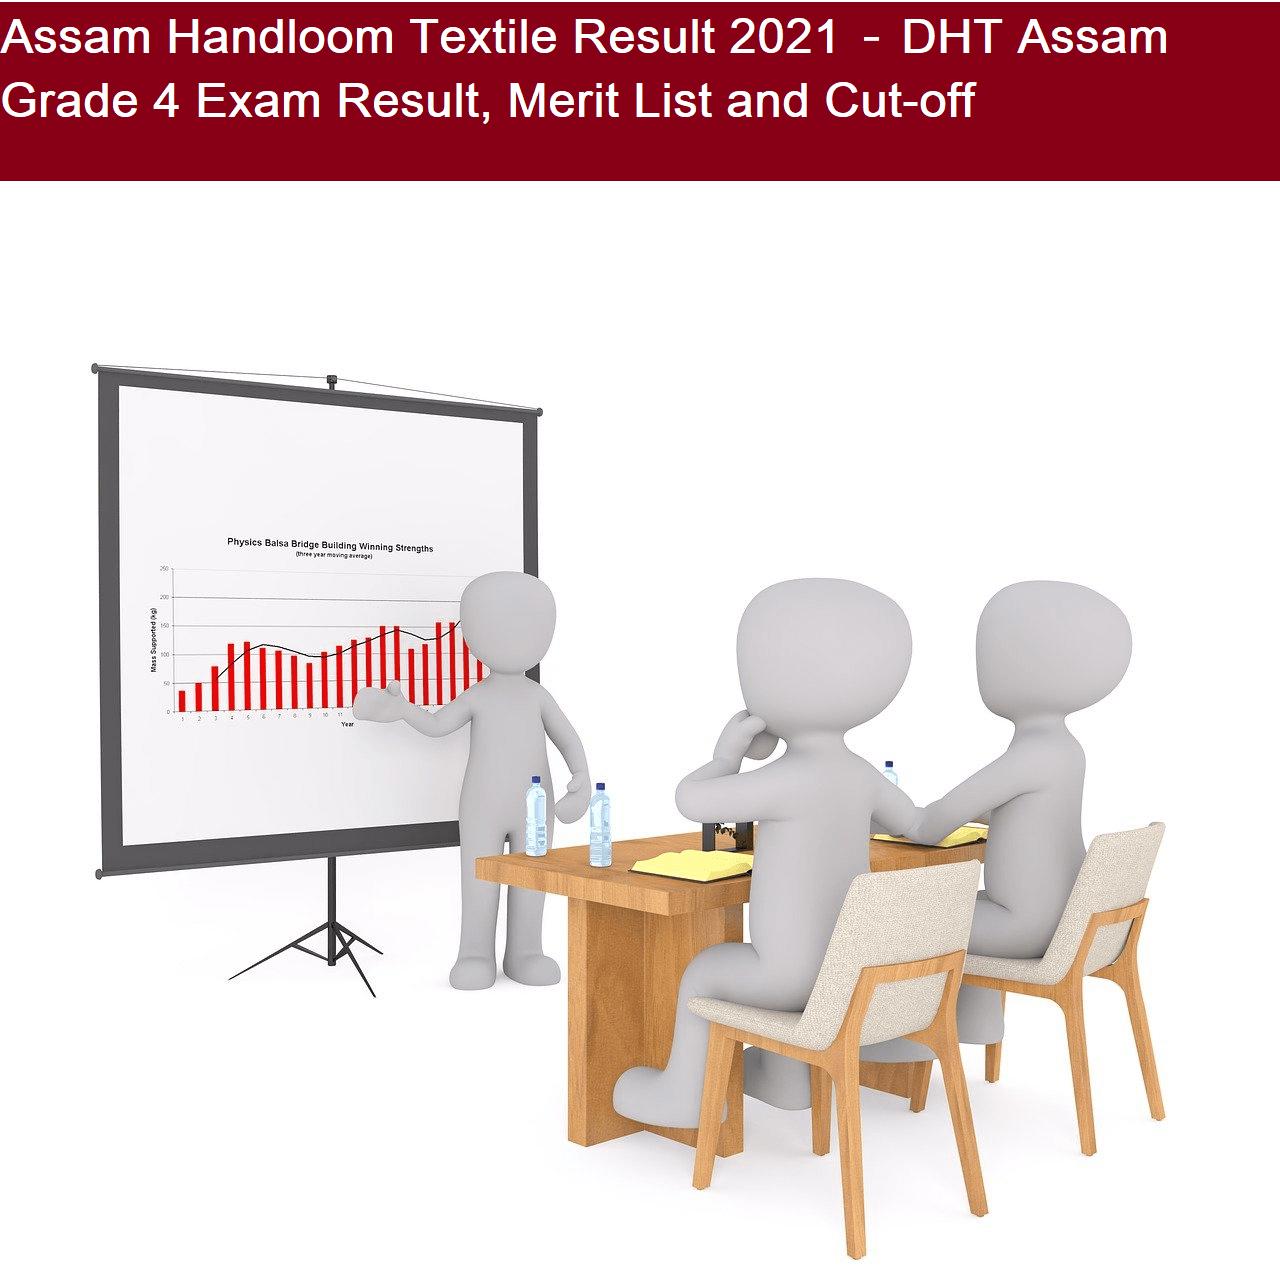 Assam Handloom Textile Result